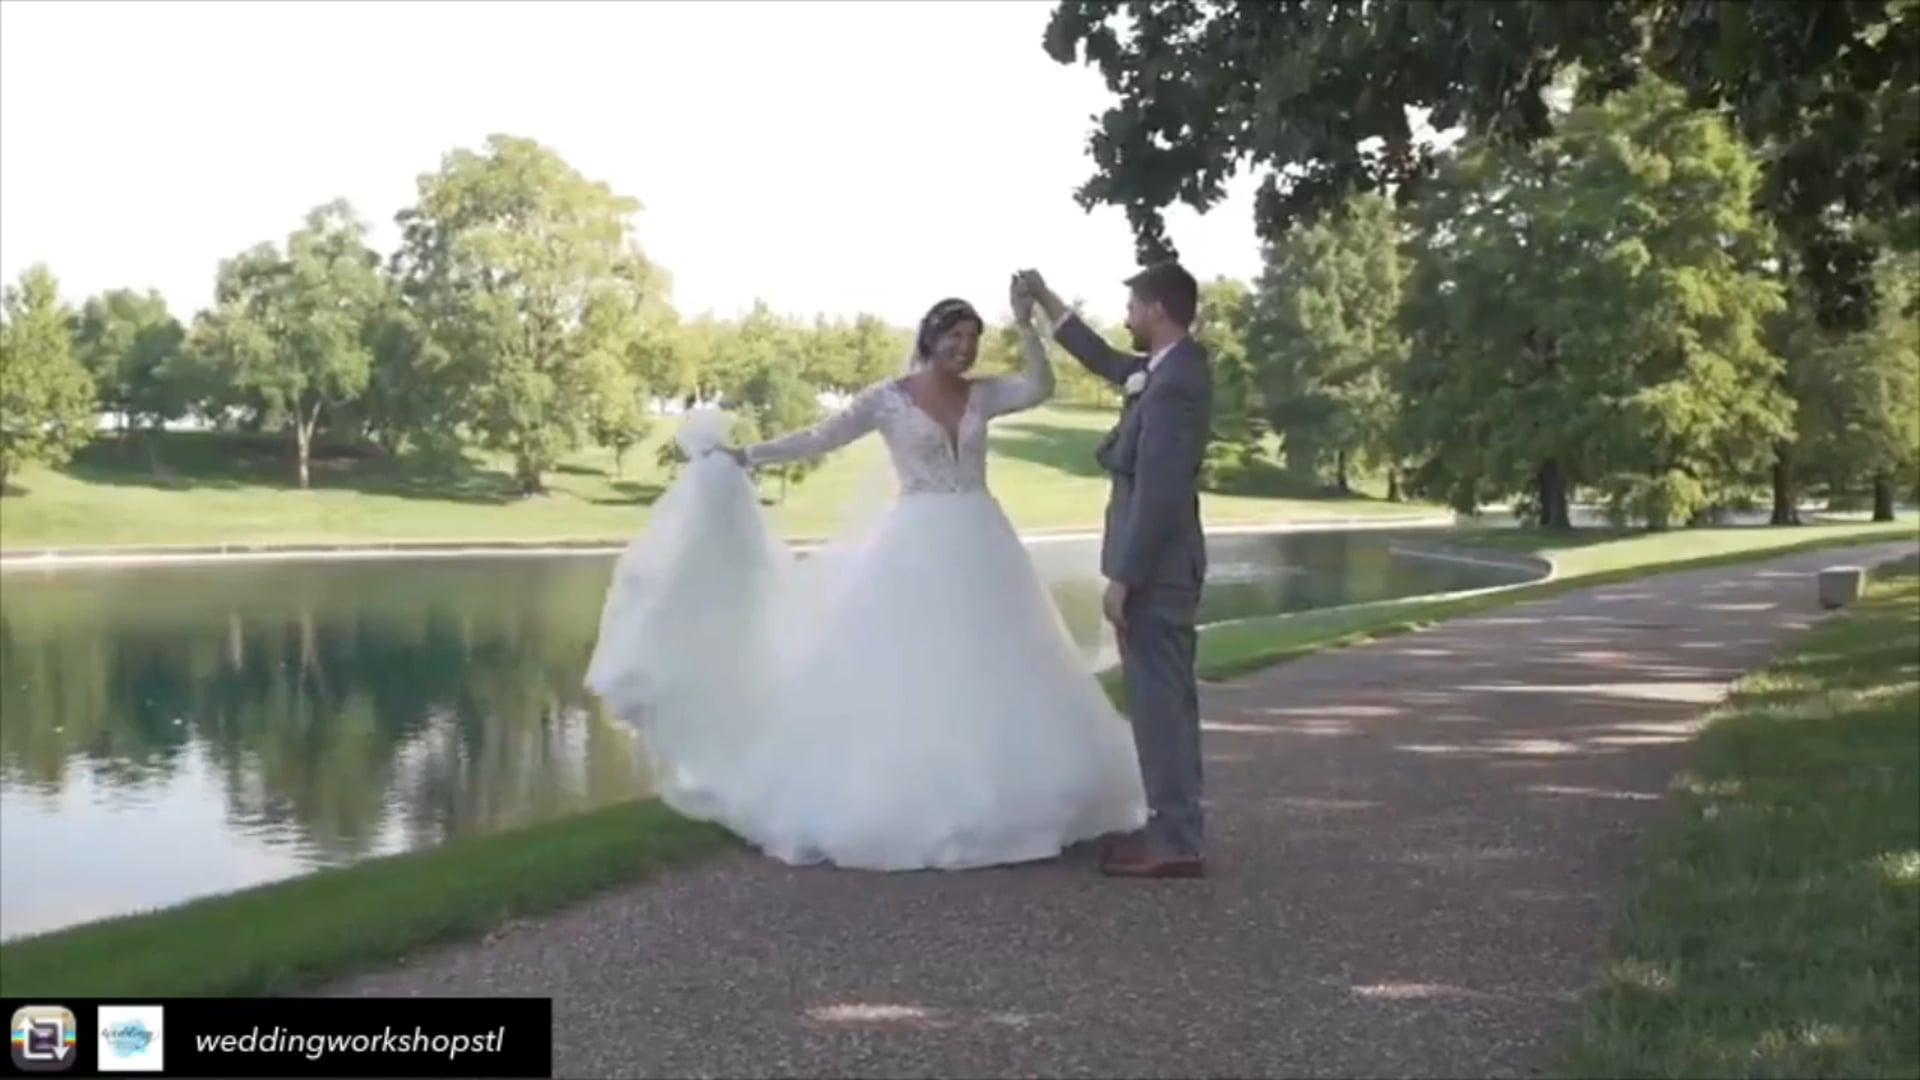 Choreographing wedding dance- with Wedding Workshops Stl